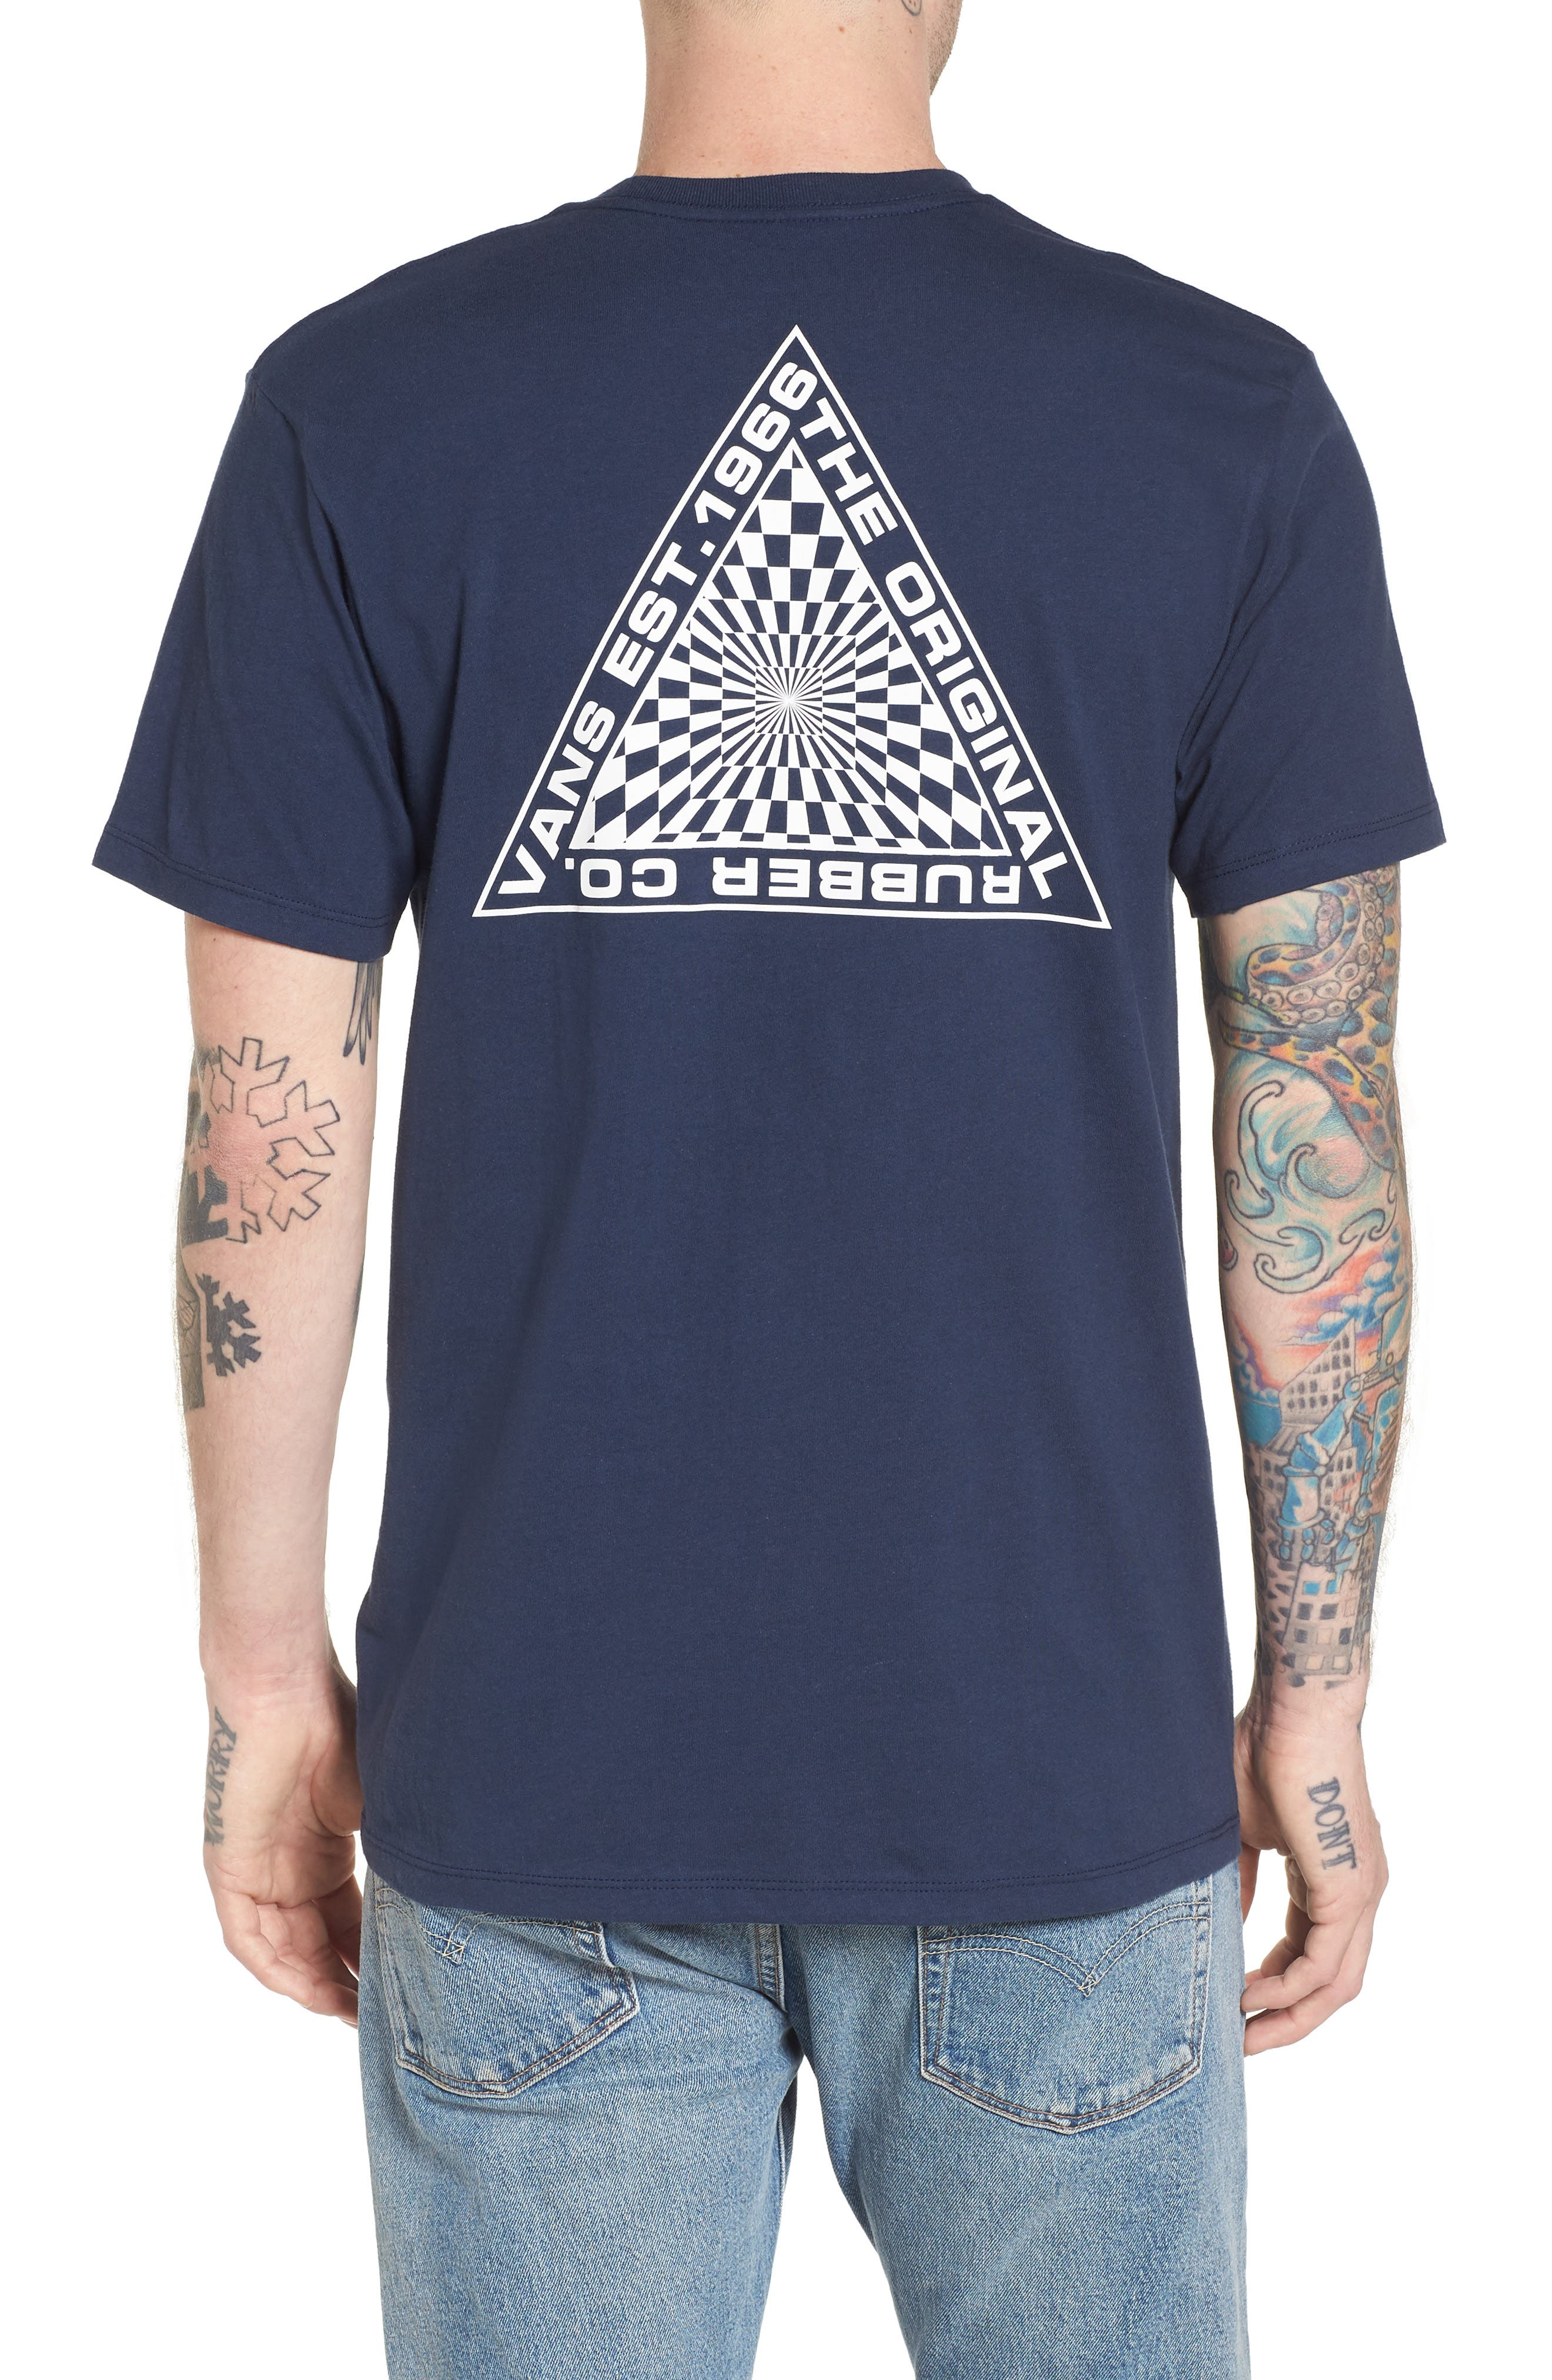 Hypnotics T-Shirt,                             Alternate thumbnail 2, color,                             Dress Blues